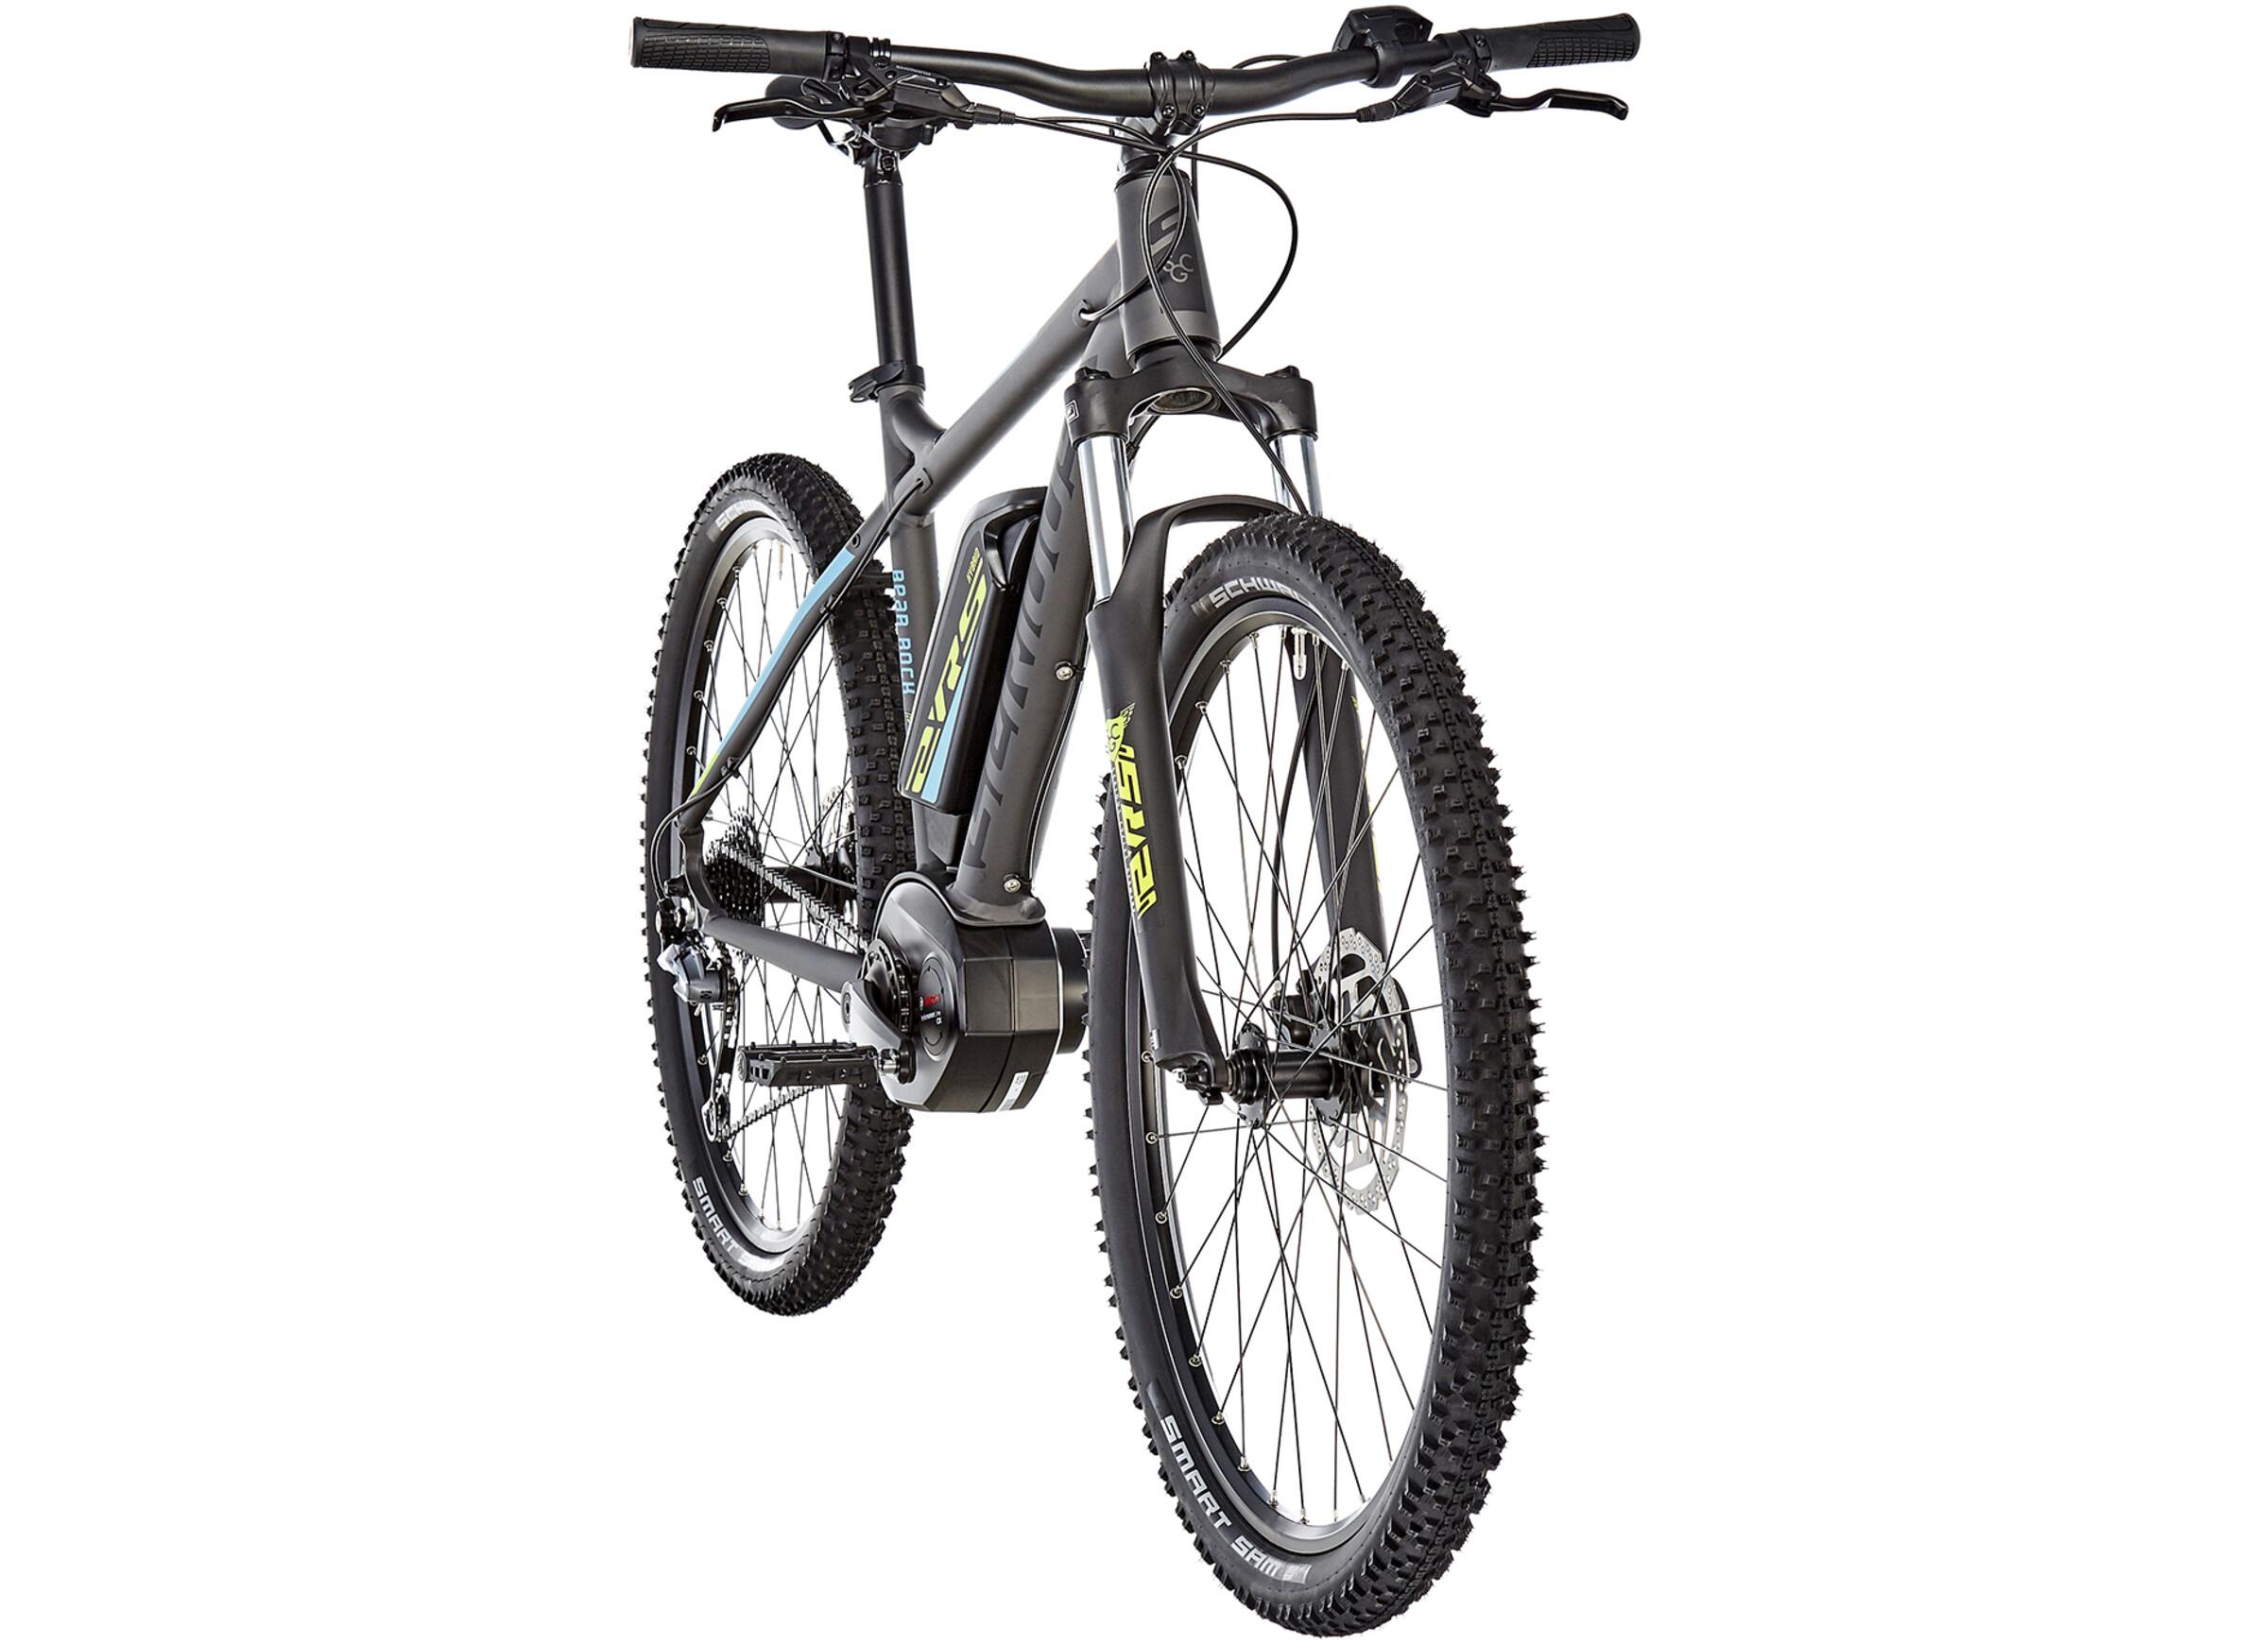 Serious Bear Rock Power E-mountainbike 27,5 sort | Find cykeltilbehør på nettet | Bikester.dk